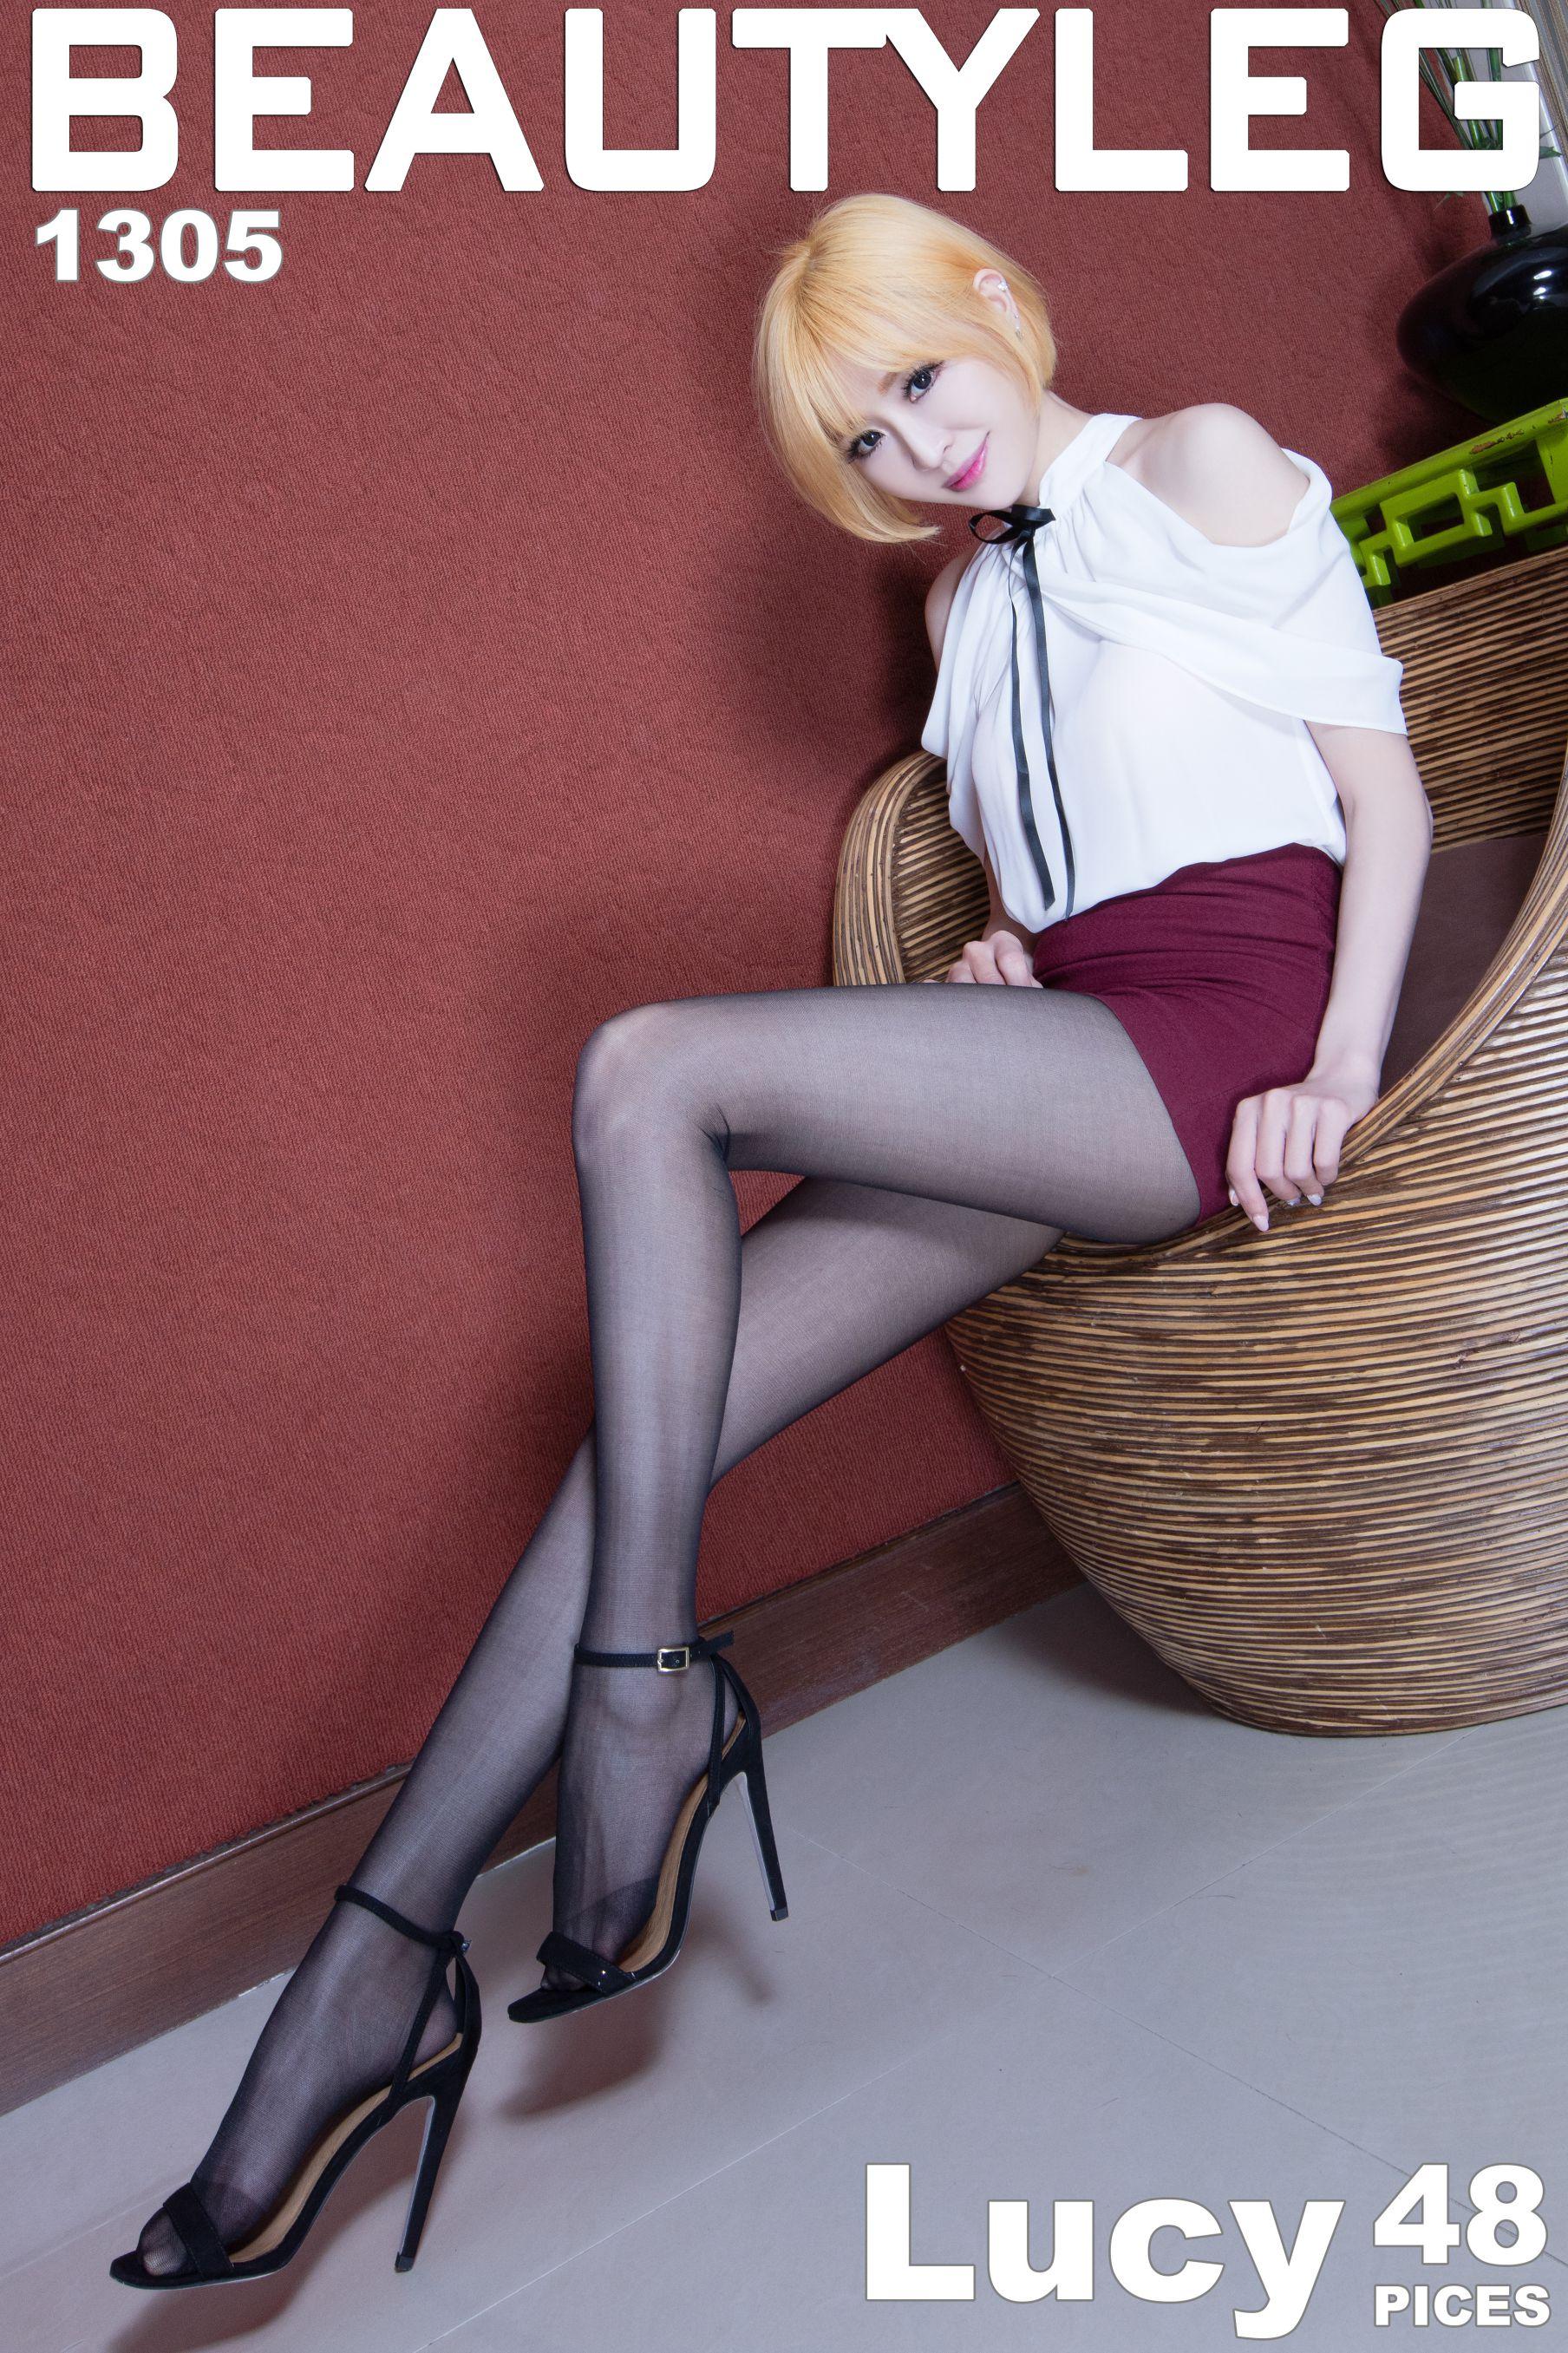 VOL.245 [Beautyleg]美腿极品丝袜美腿黑丝:倪千凌(腿模Lucy,陈佳筠)超高清个人性感漂亮大图(43P)